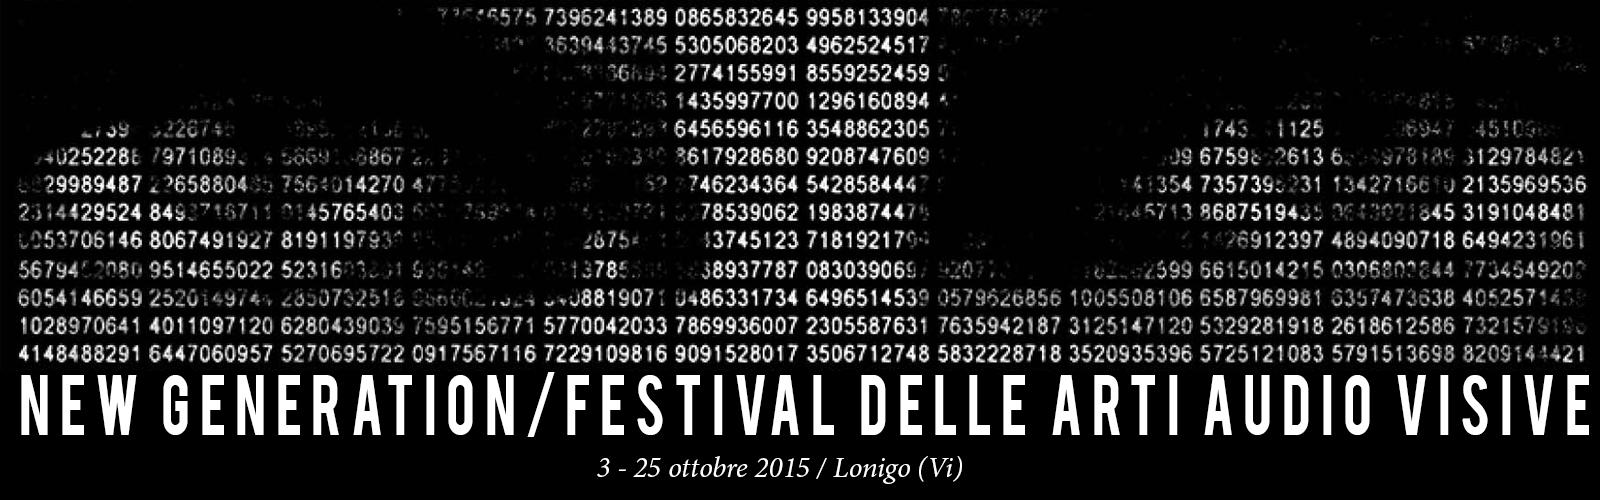 new-generation-festival